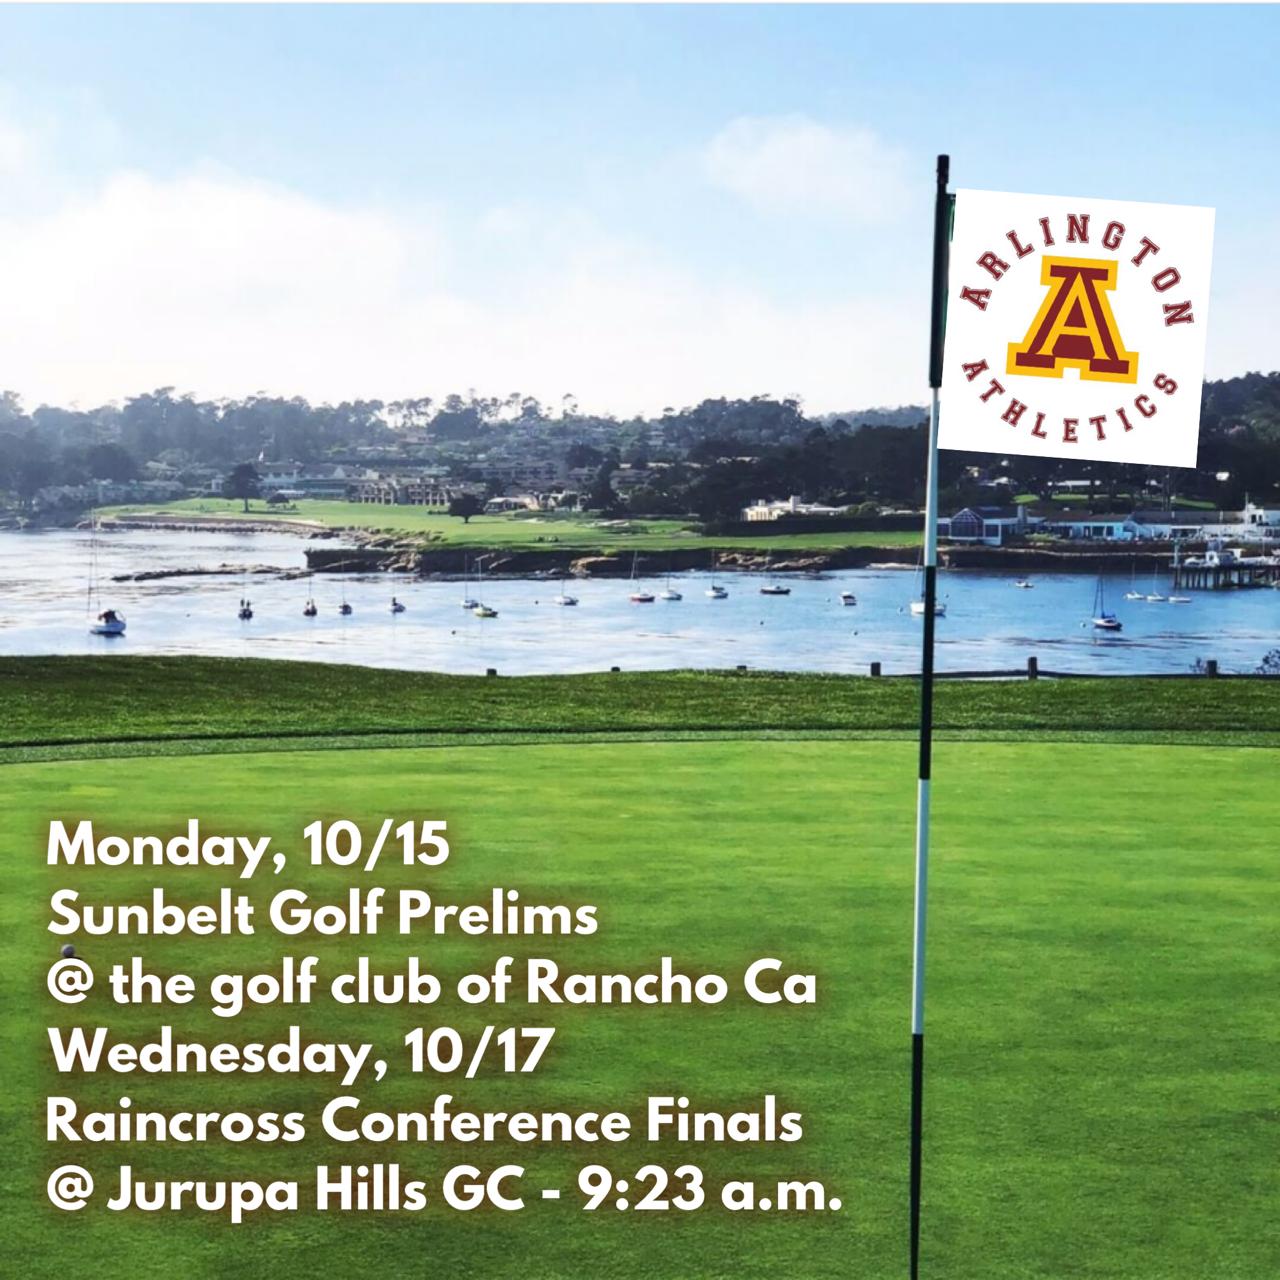 Monday, 10/15: Arlington Girls' Golf at Sunbelt League Prelims.